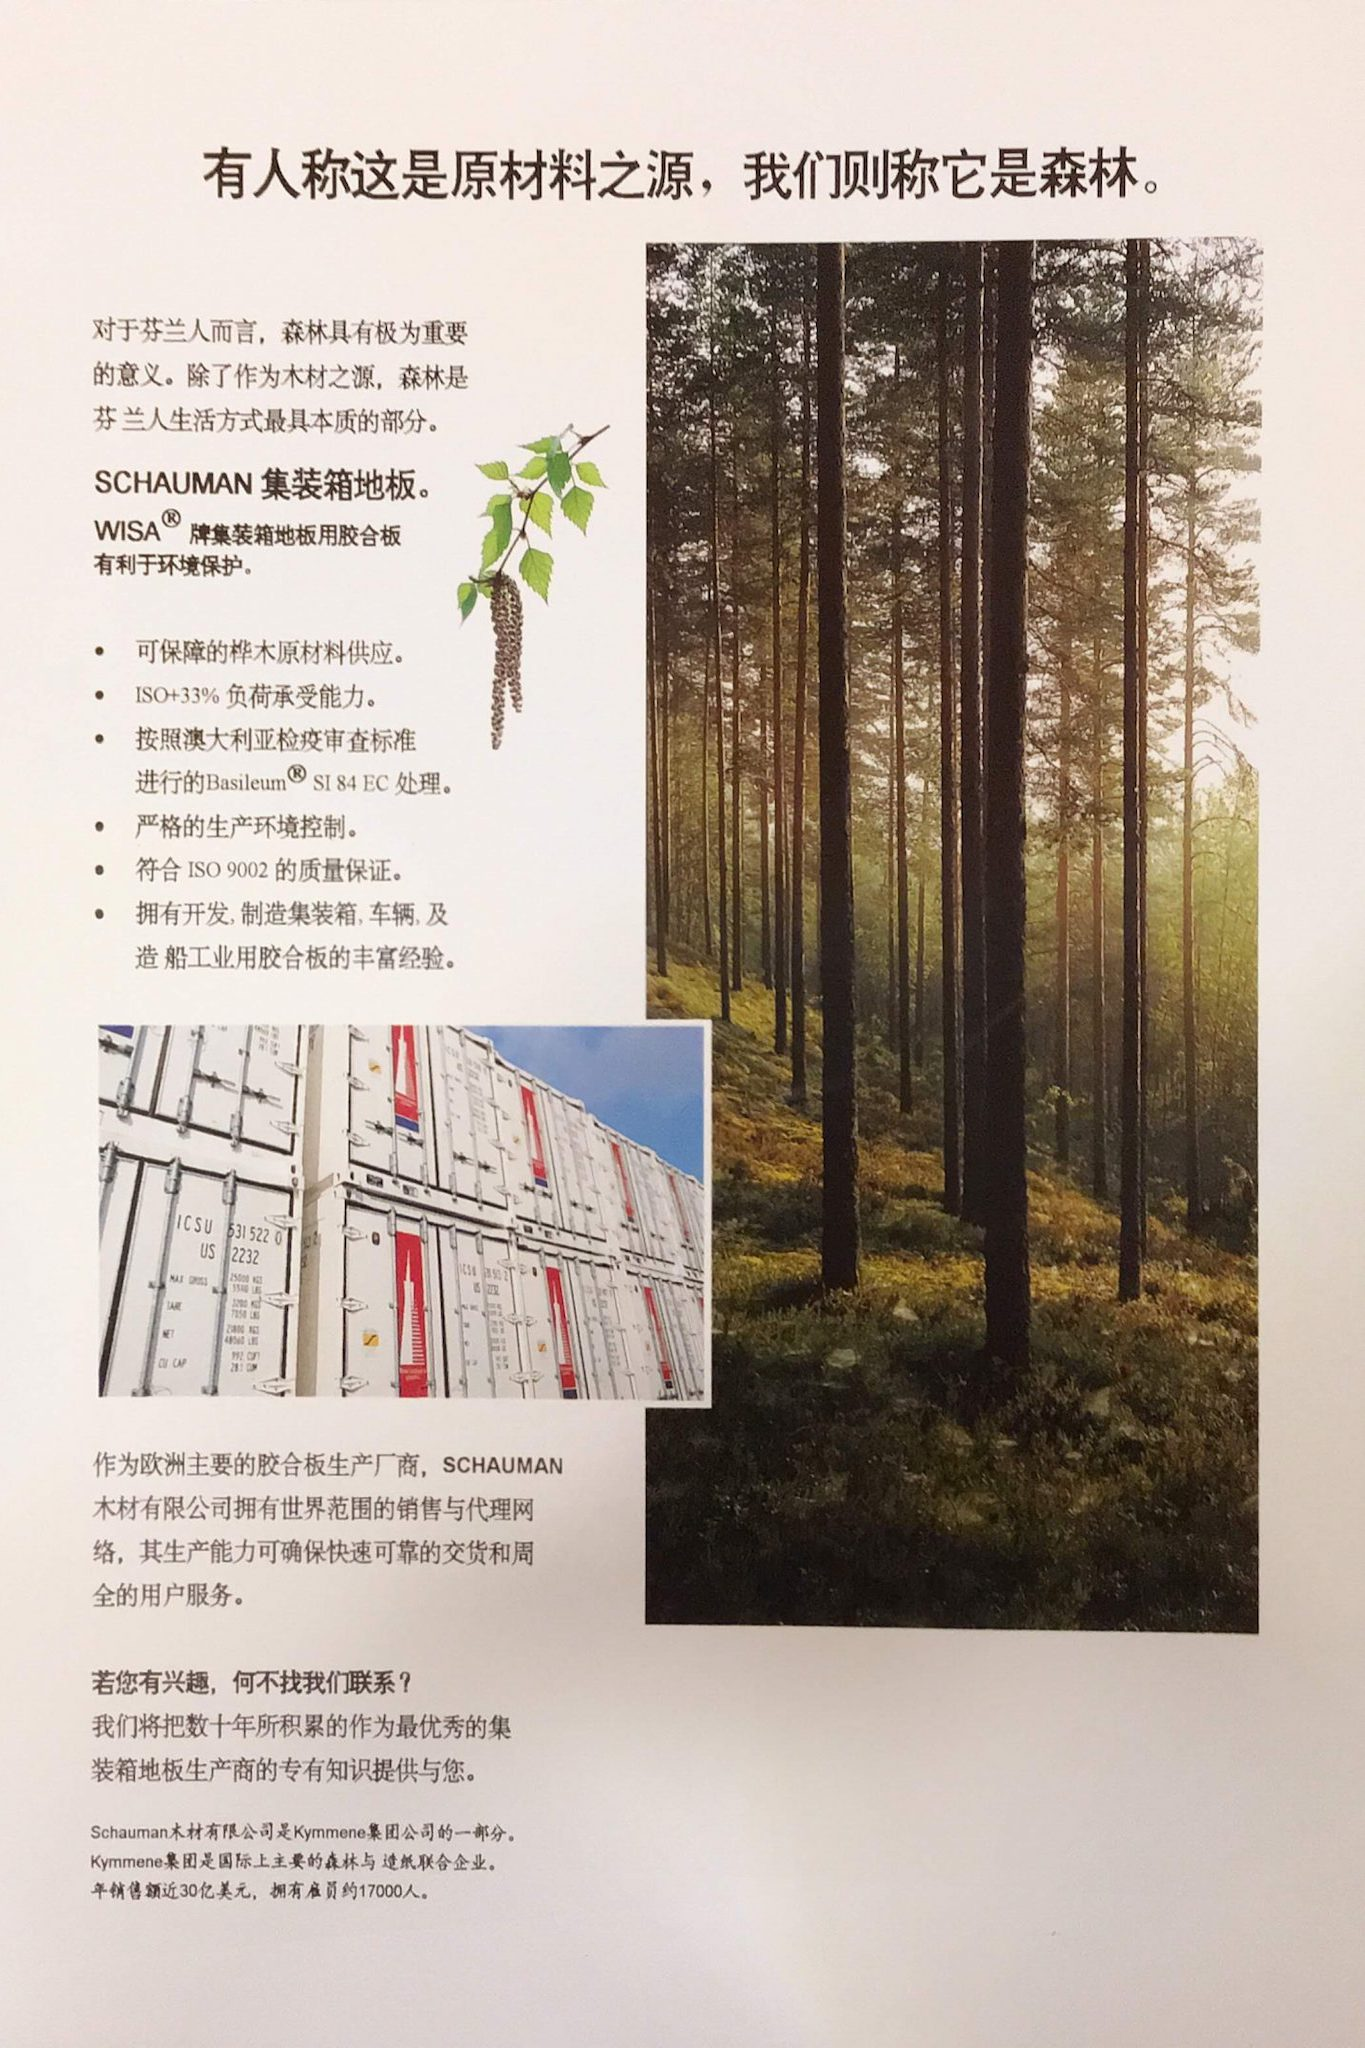 tekway-company-leaflets-brochures-kymmene-e1585130074758-1434x2048